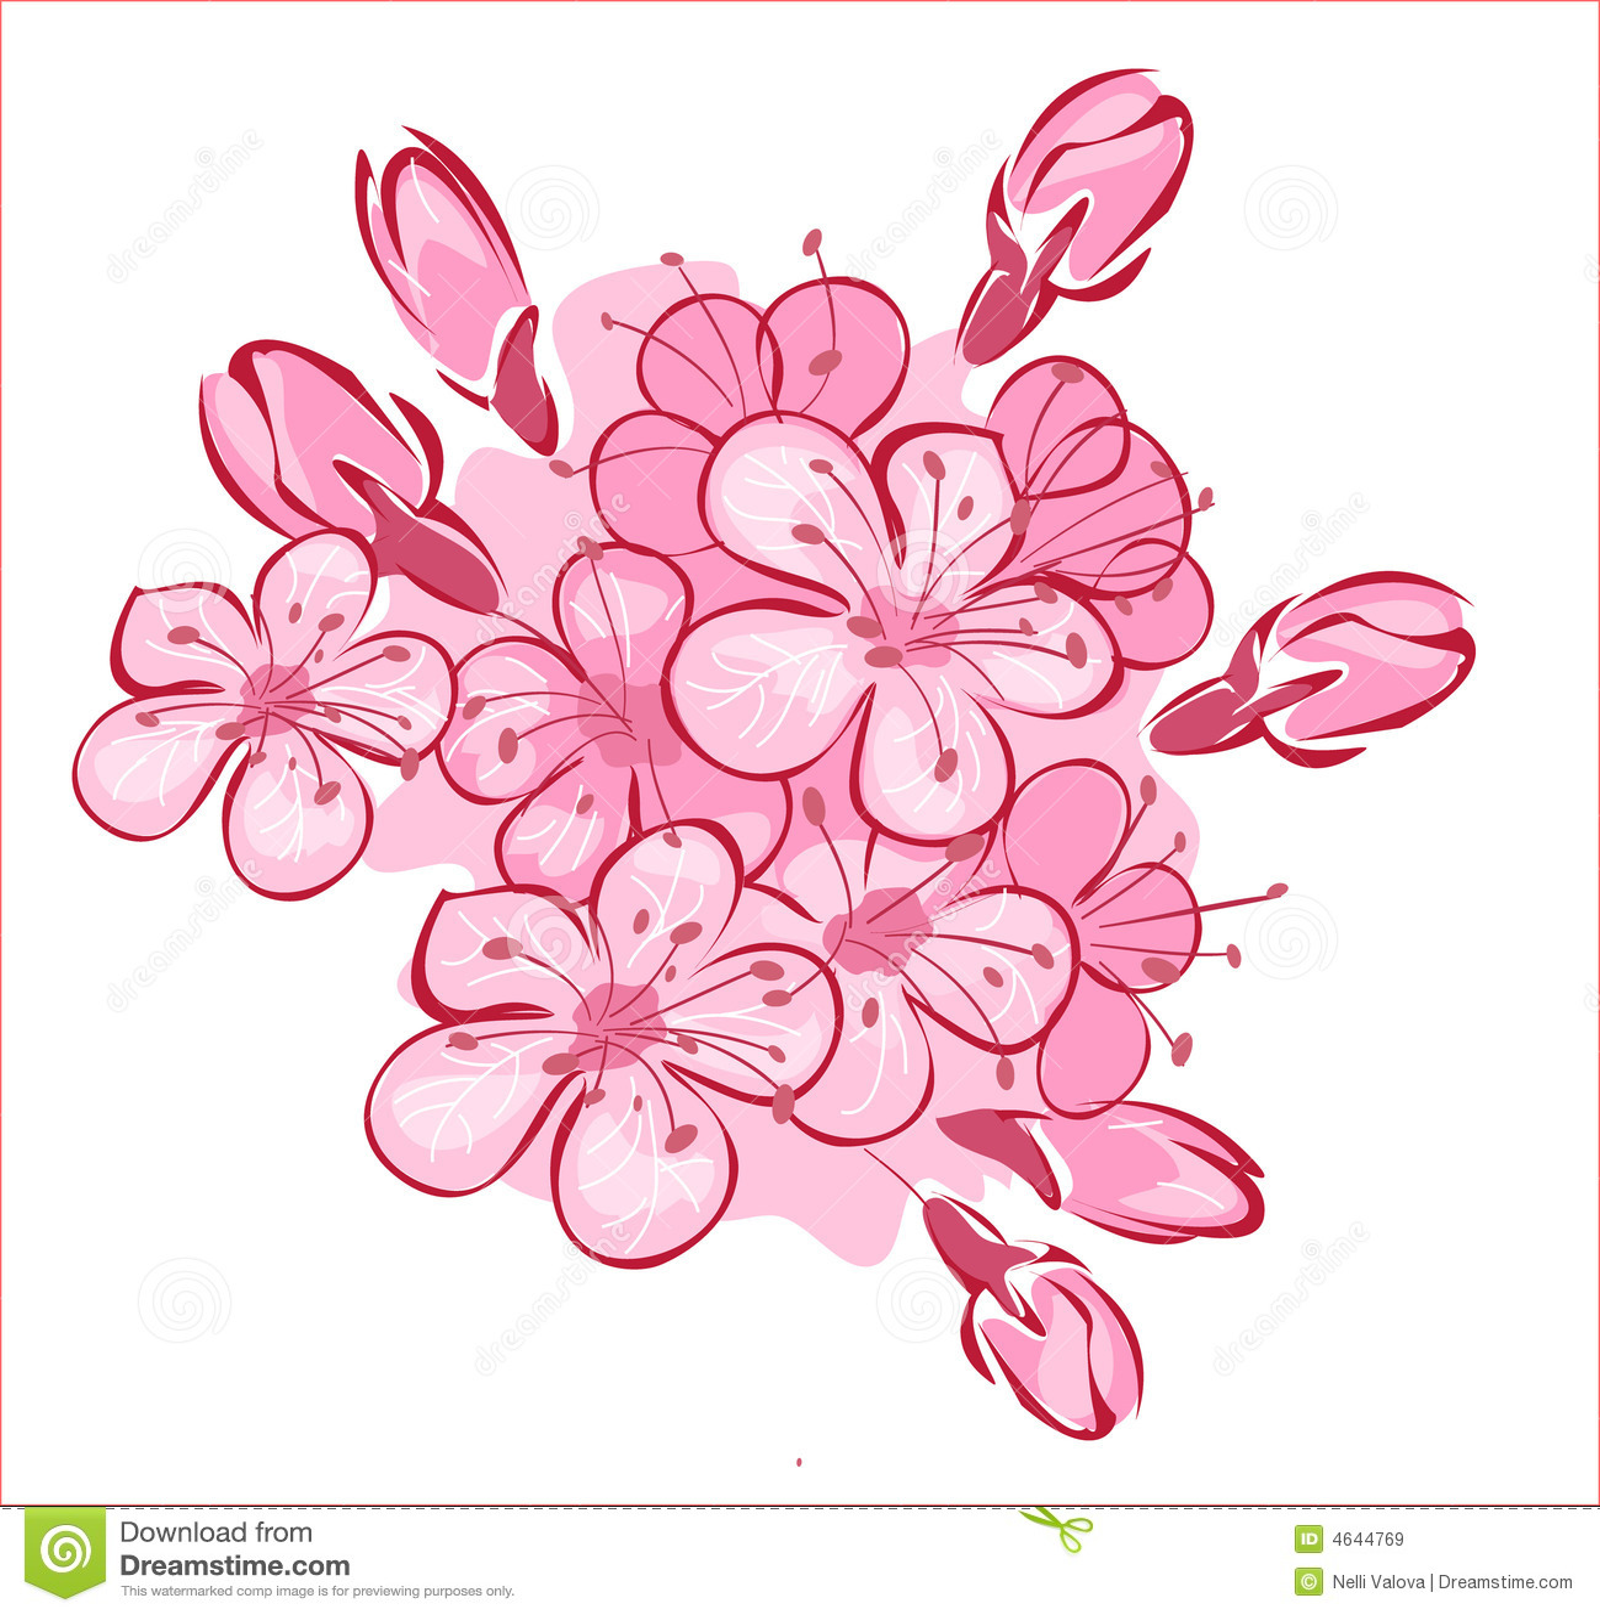 Flowerses às cerejas